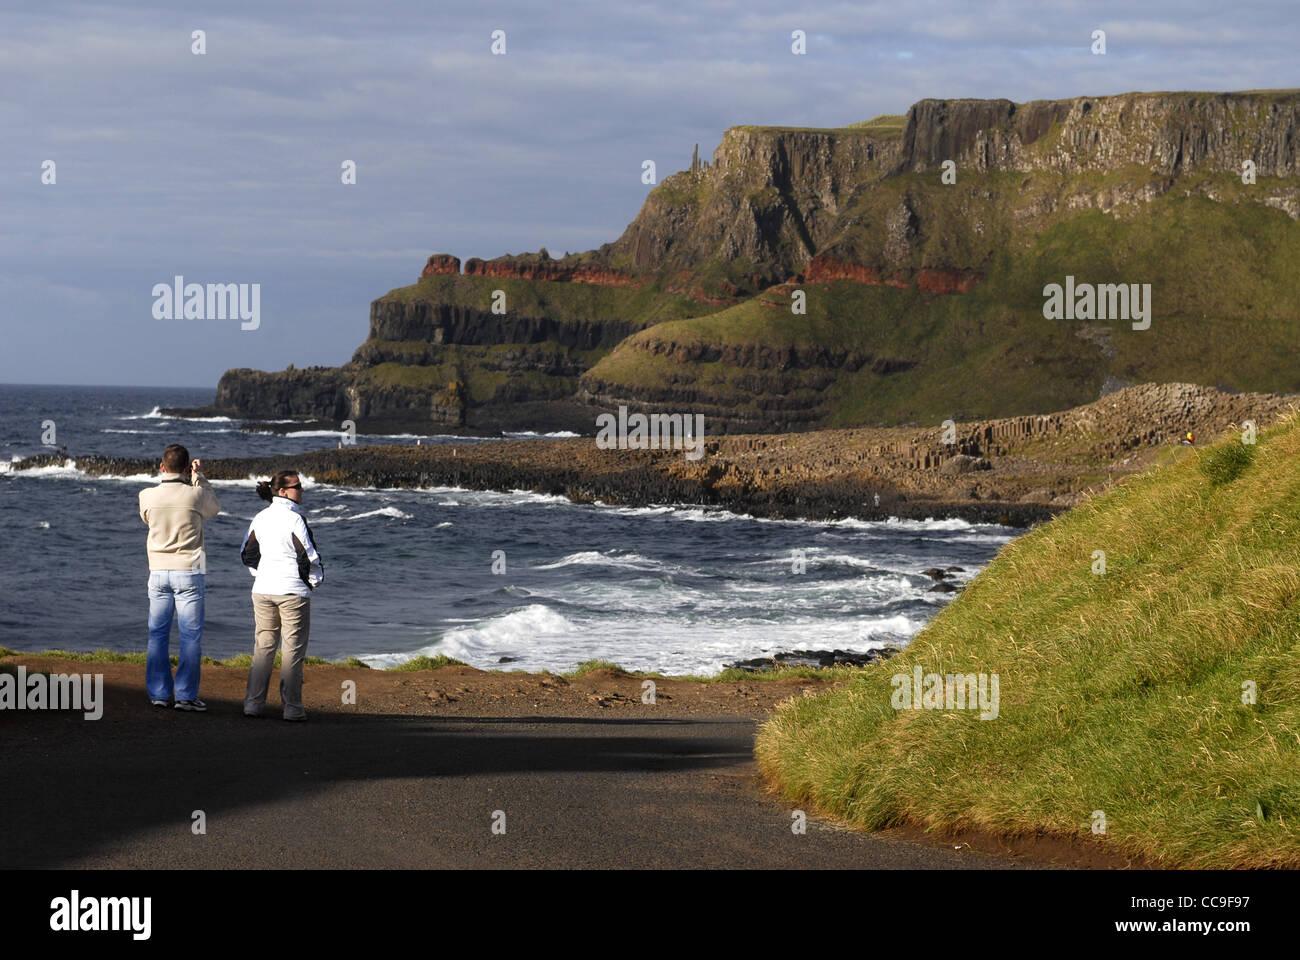 Near Giant's Causeway, Coastal Road, County Antrim, Ulster, North Ireland, UK, Europe. - Stock Image